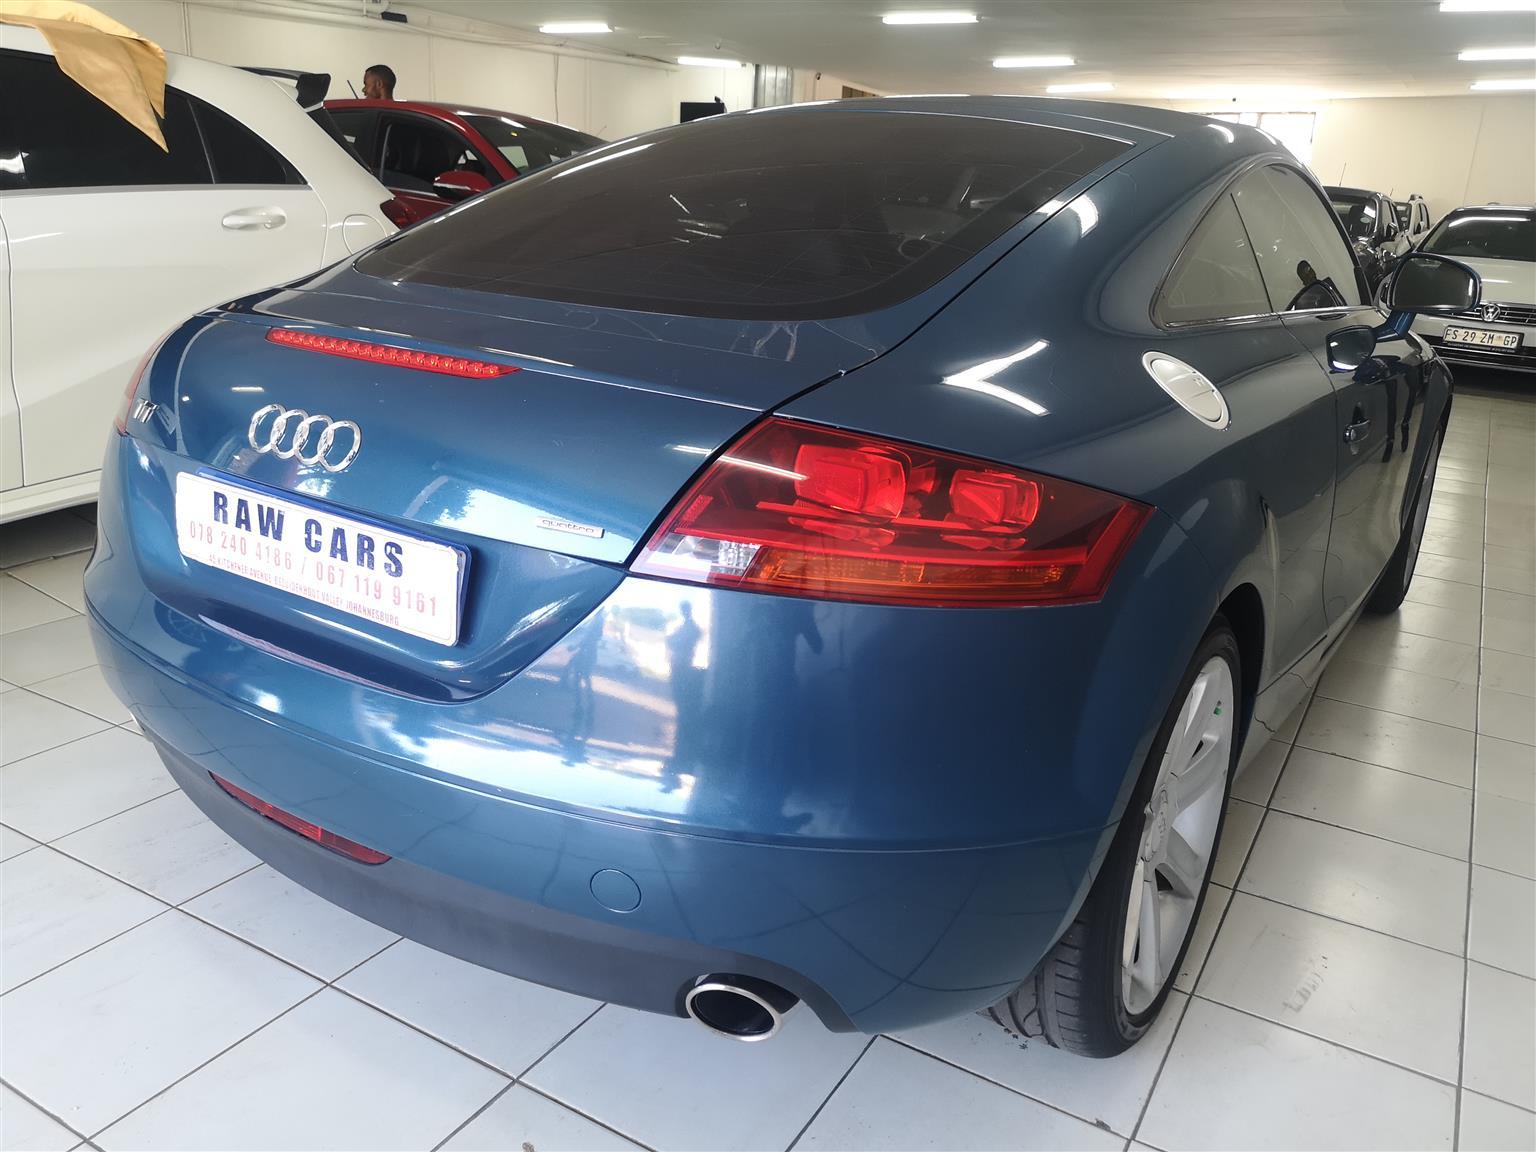 2007 Audi TT coupe coupe 2.0T quattro